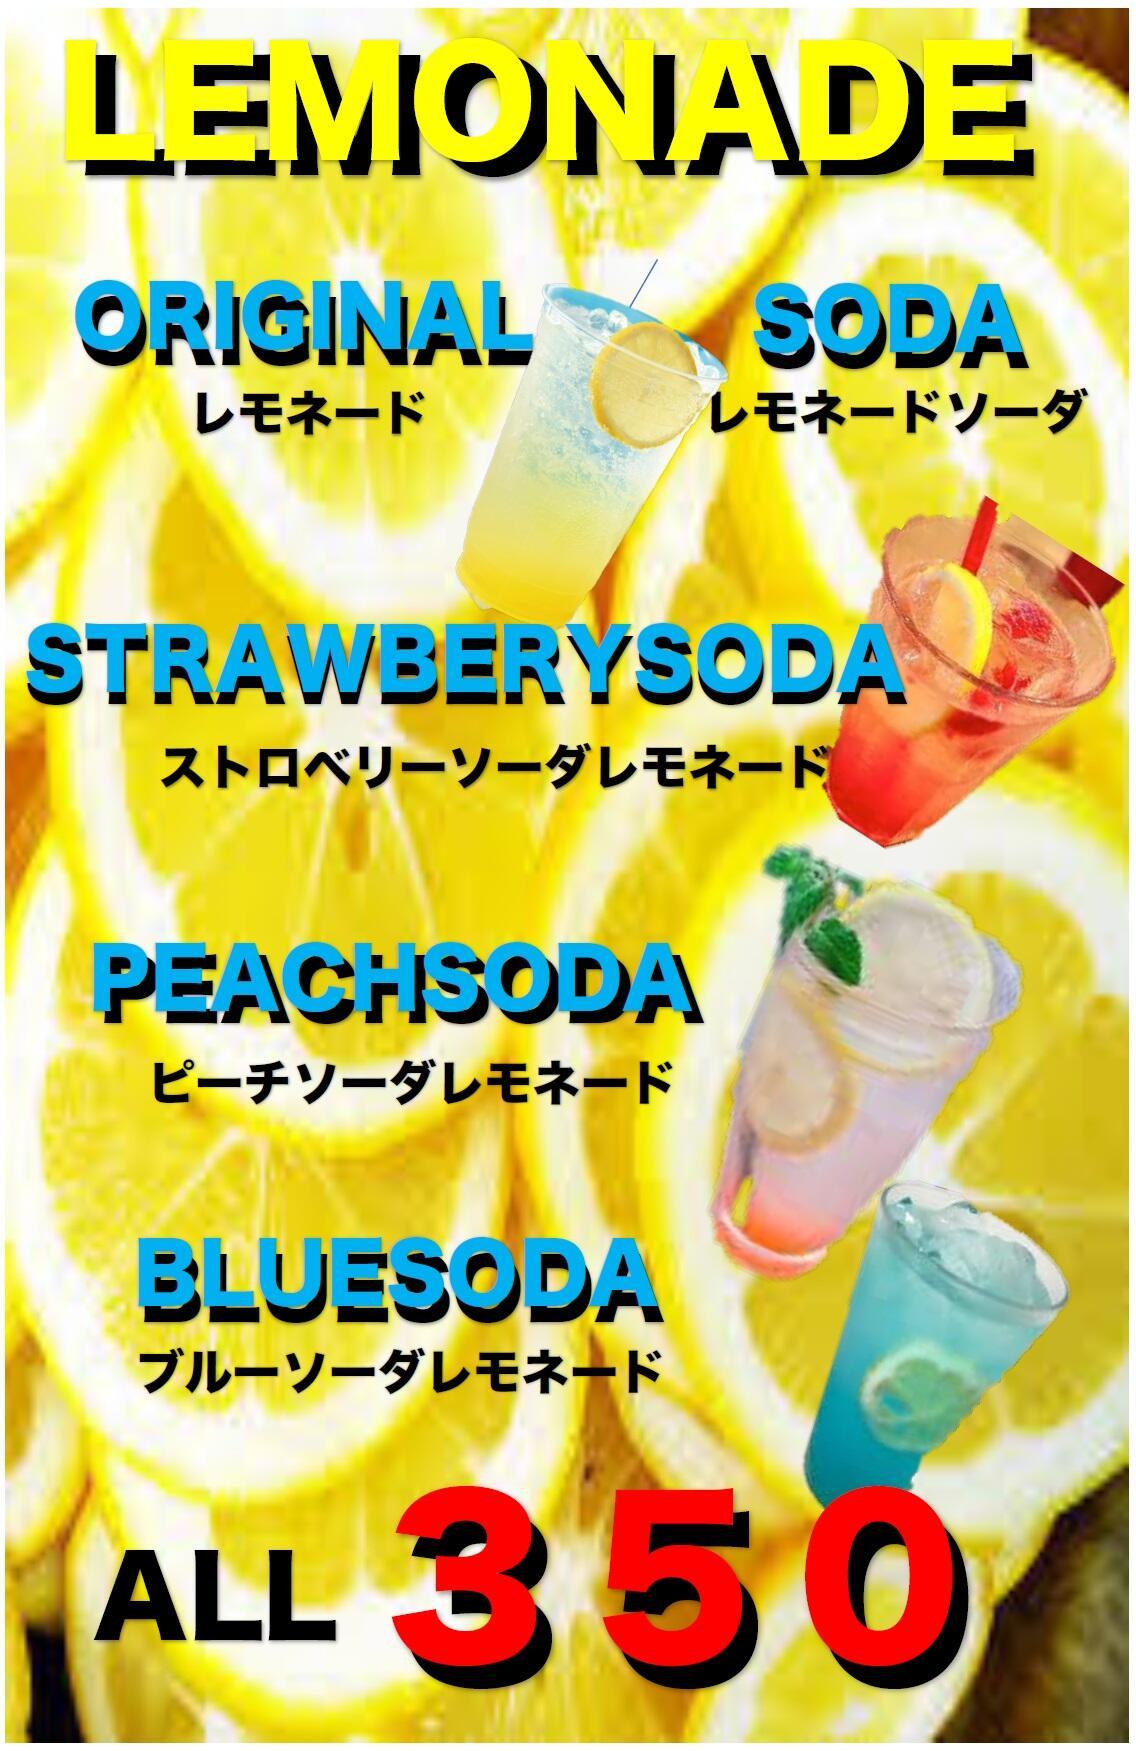 190720_lemonade1.jpg